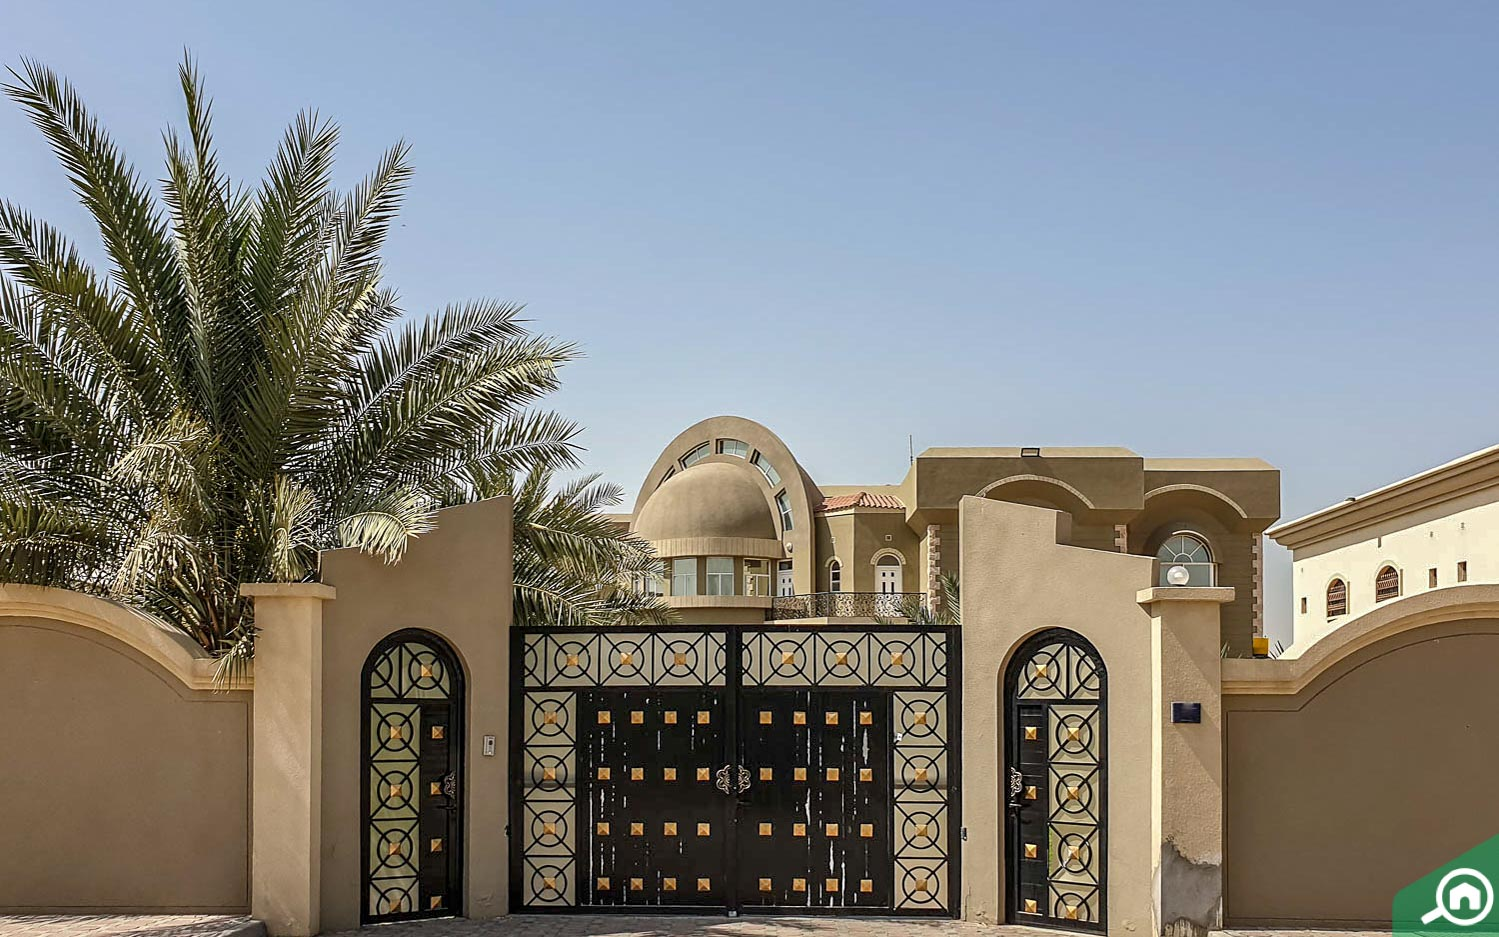 Al Gharayen houses